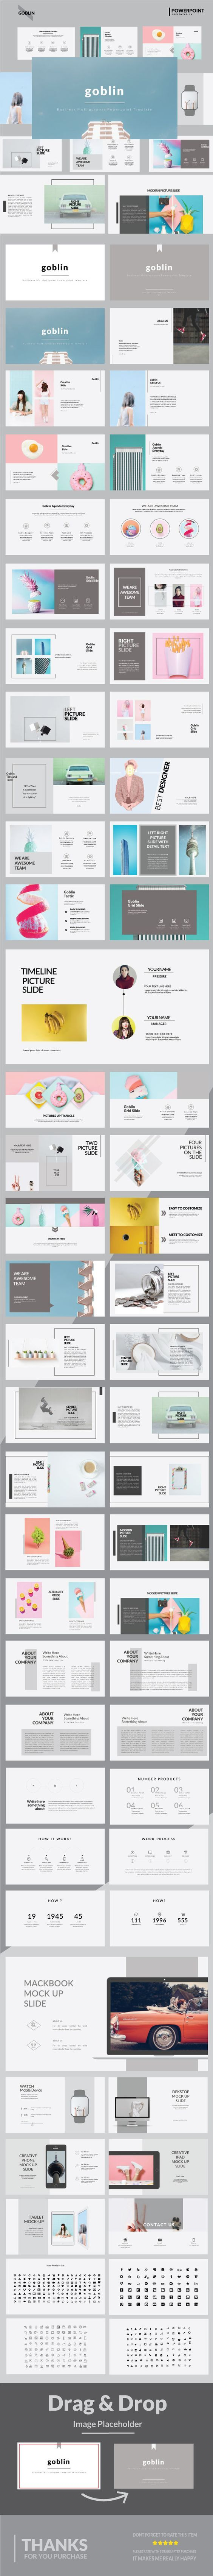 Poster design in powerpoint - Goblin Multipurpose Powerpoint Template